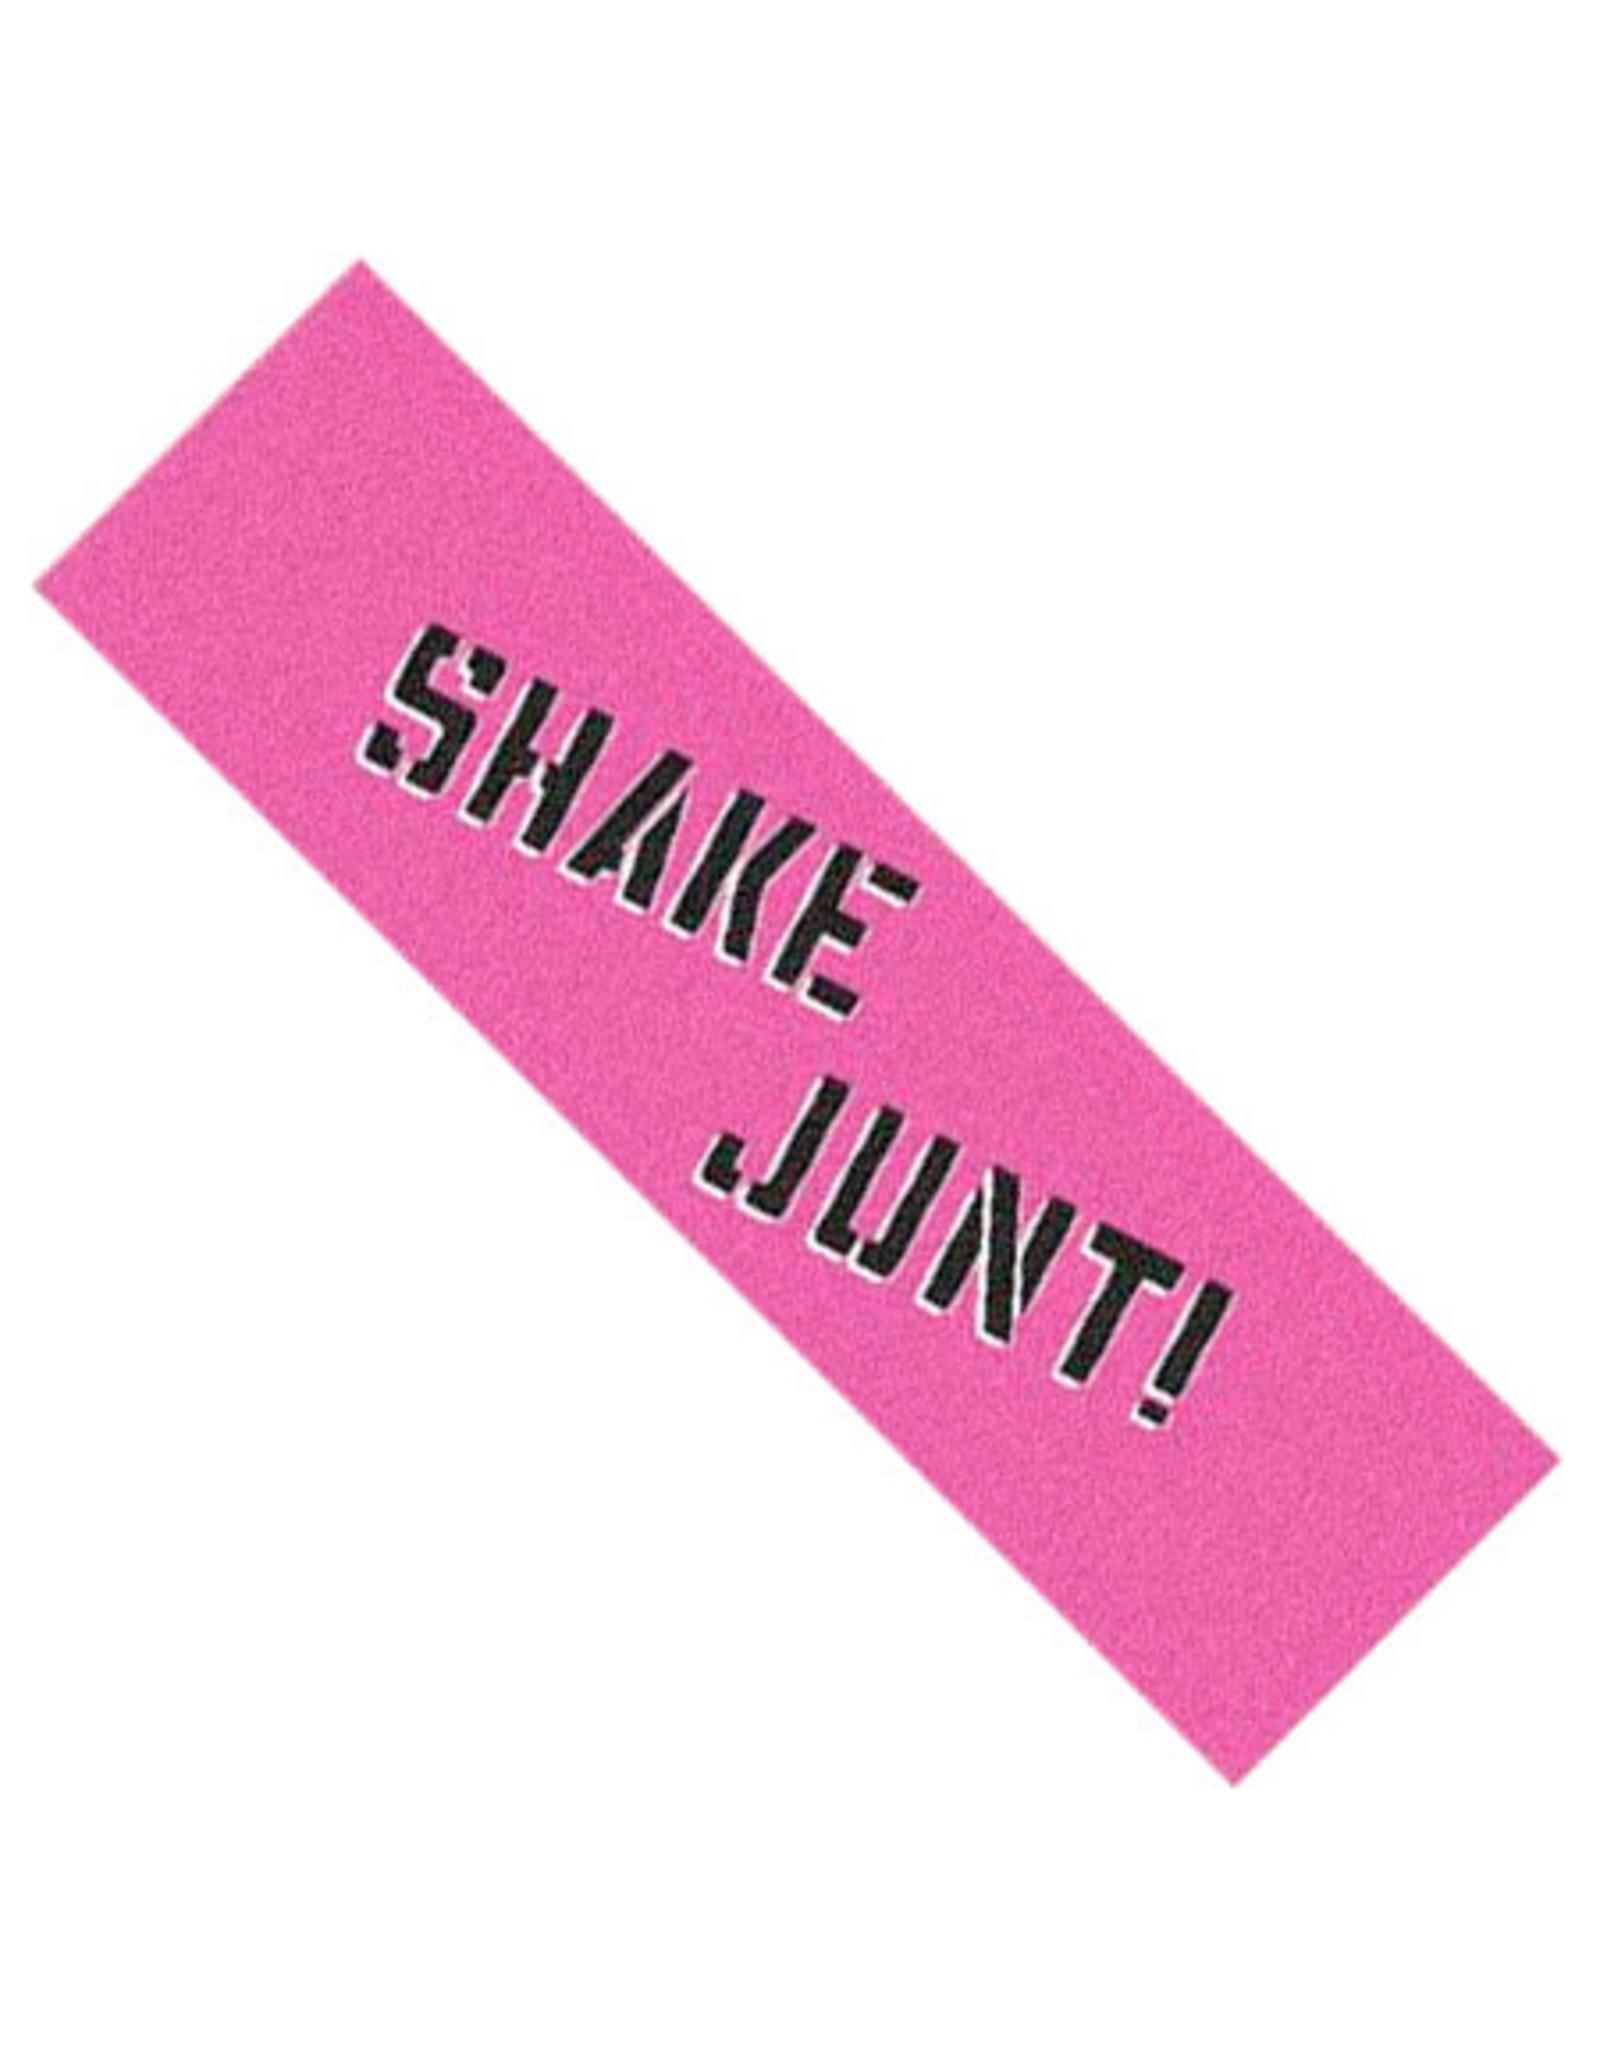 SHAKE JUNT SHAKE JUNT - PINK/BLACK GRIP